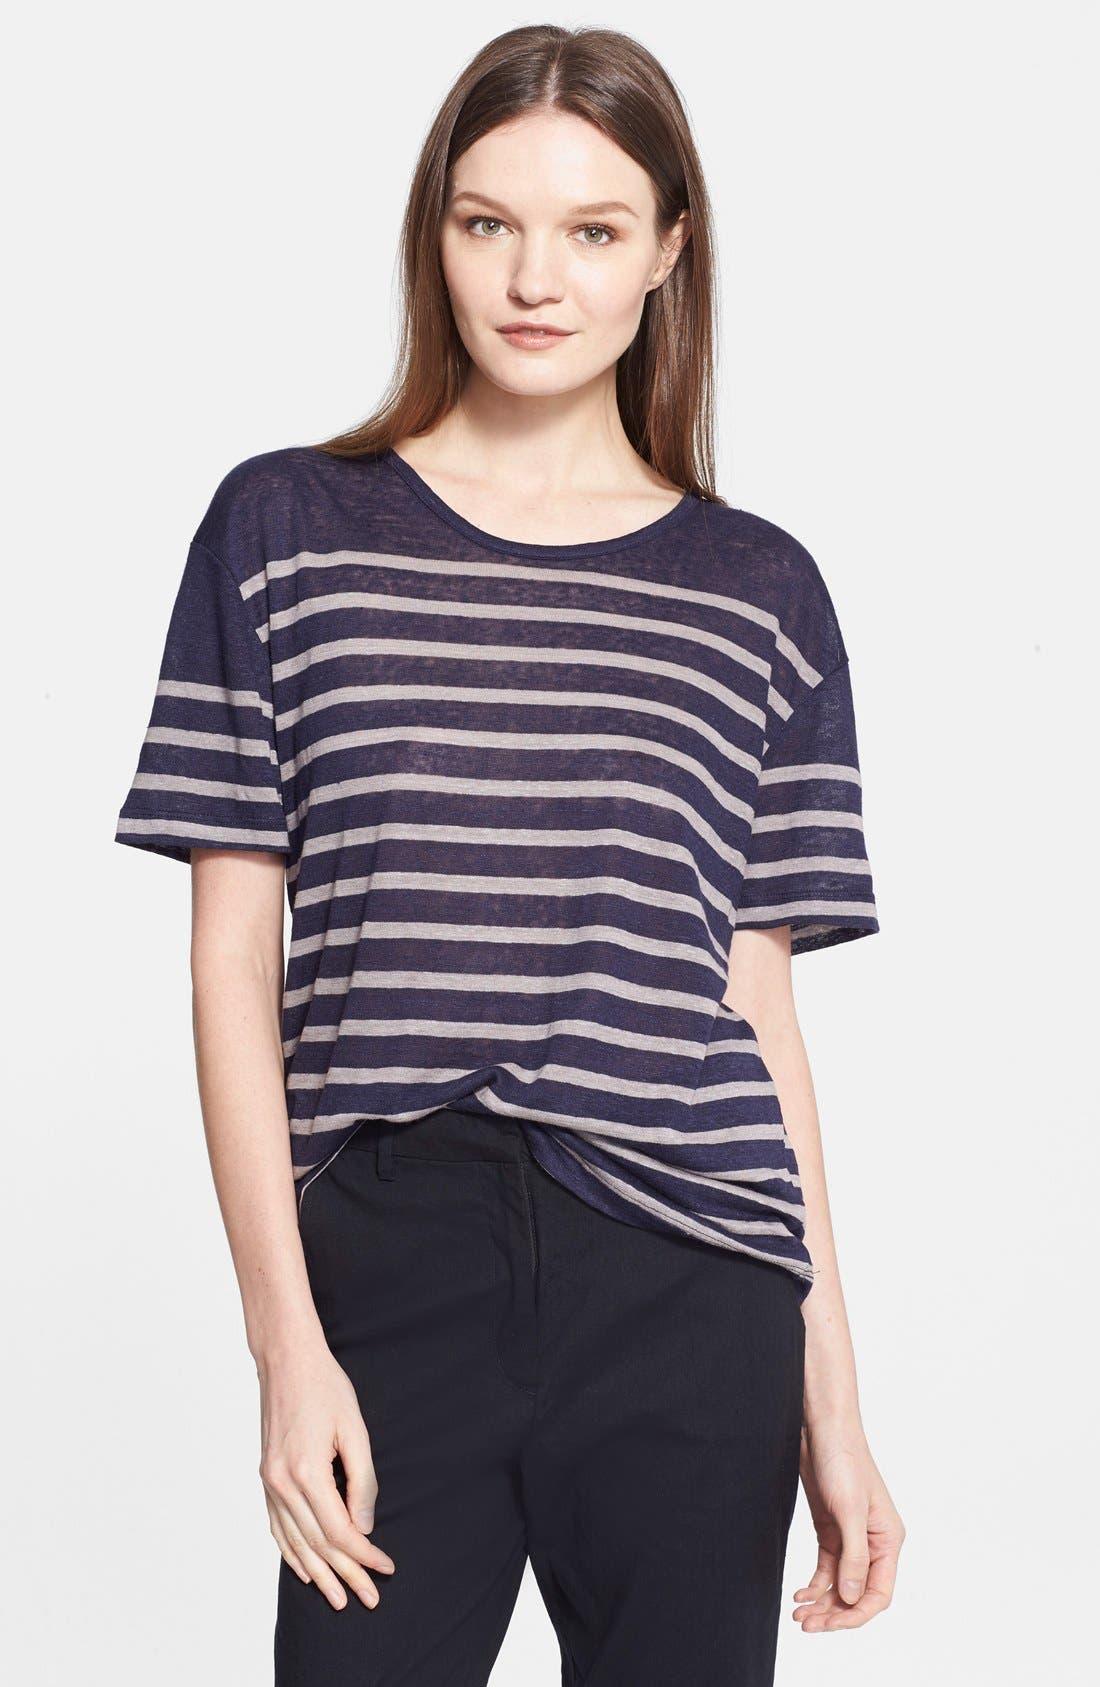 Main Image - Charlotte Gainsbourg for Current/Elliott 'The Short Sleeve Linen Stripe' Tee